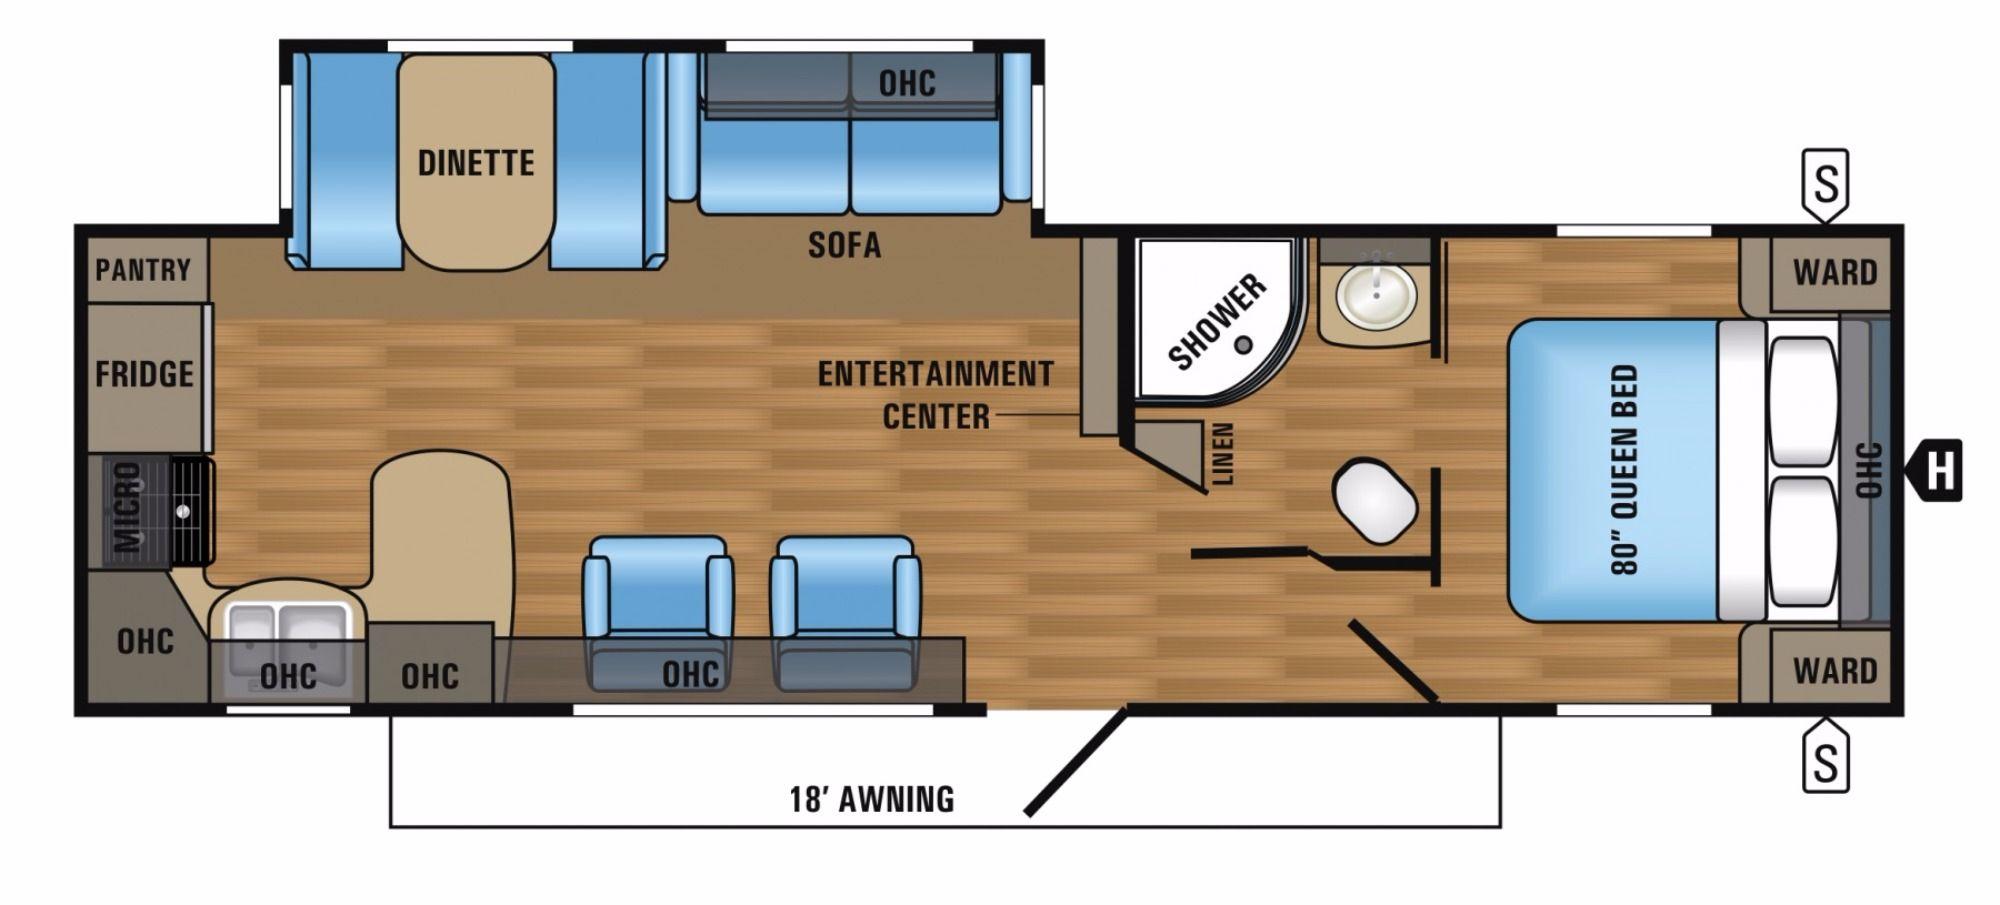 Floor Plan Travel trailers for sale, Floor plans, Jayco